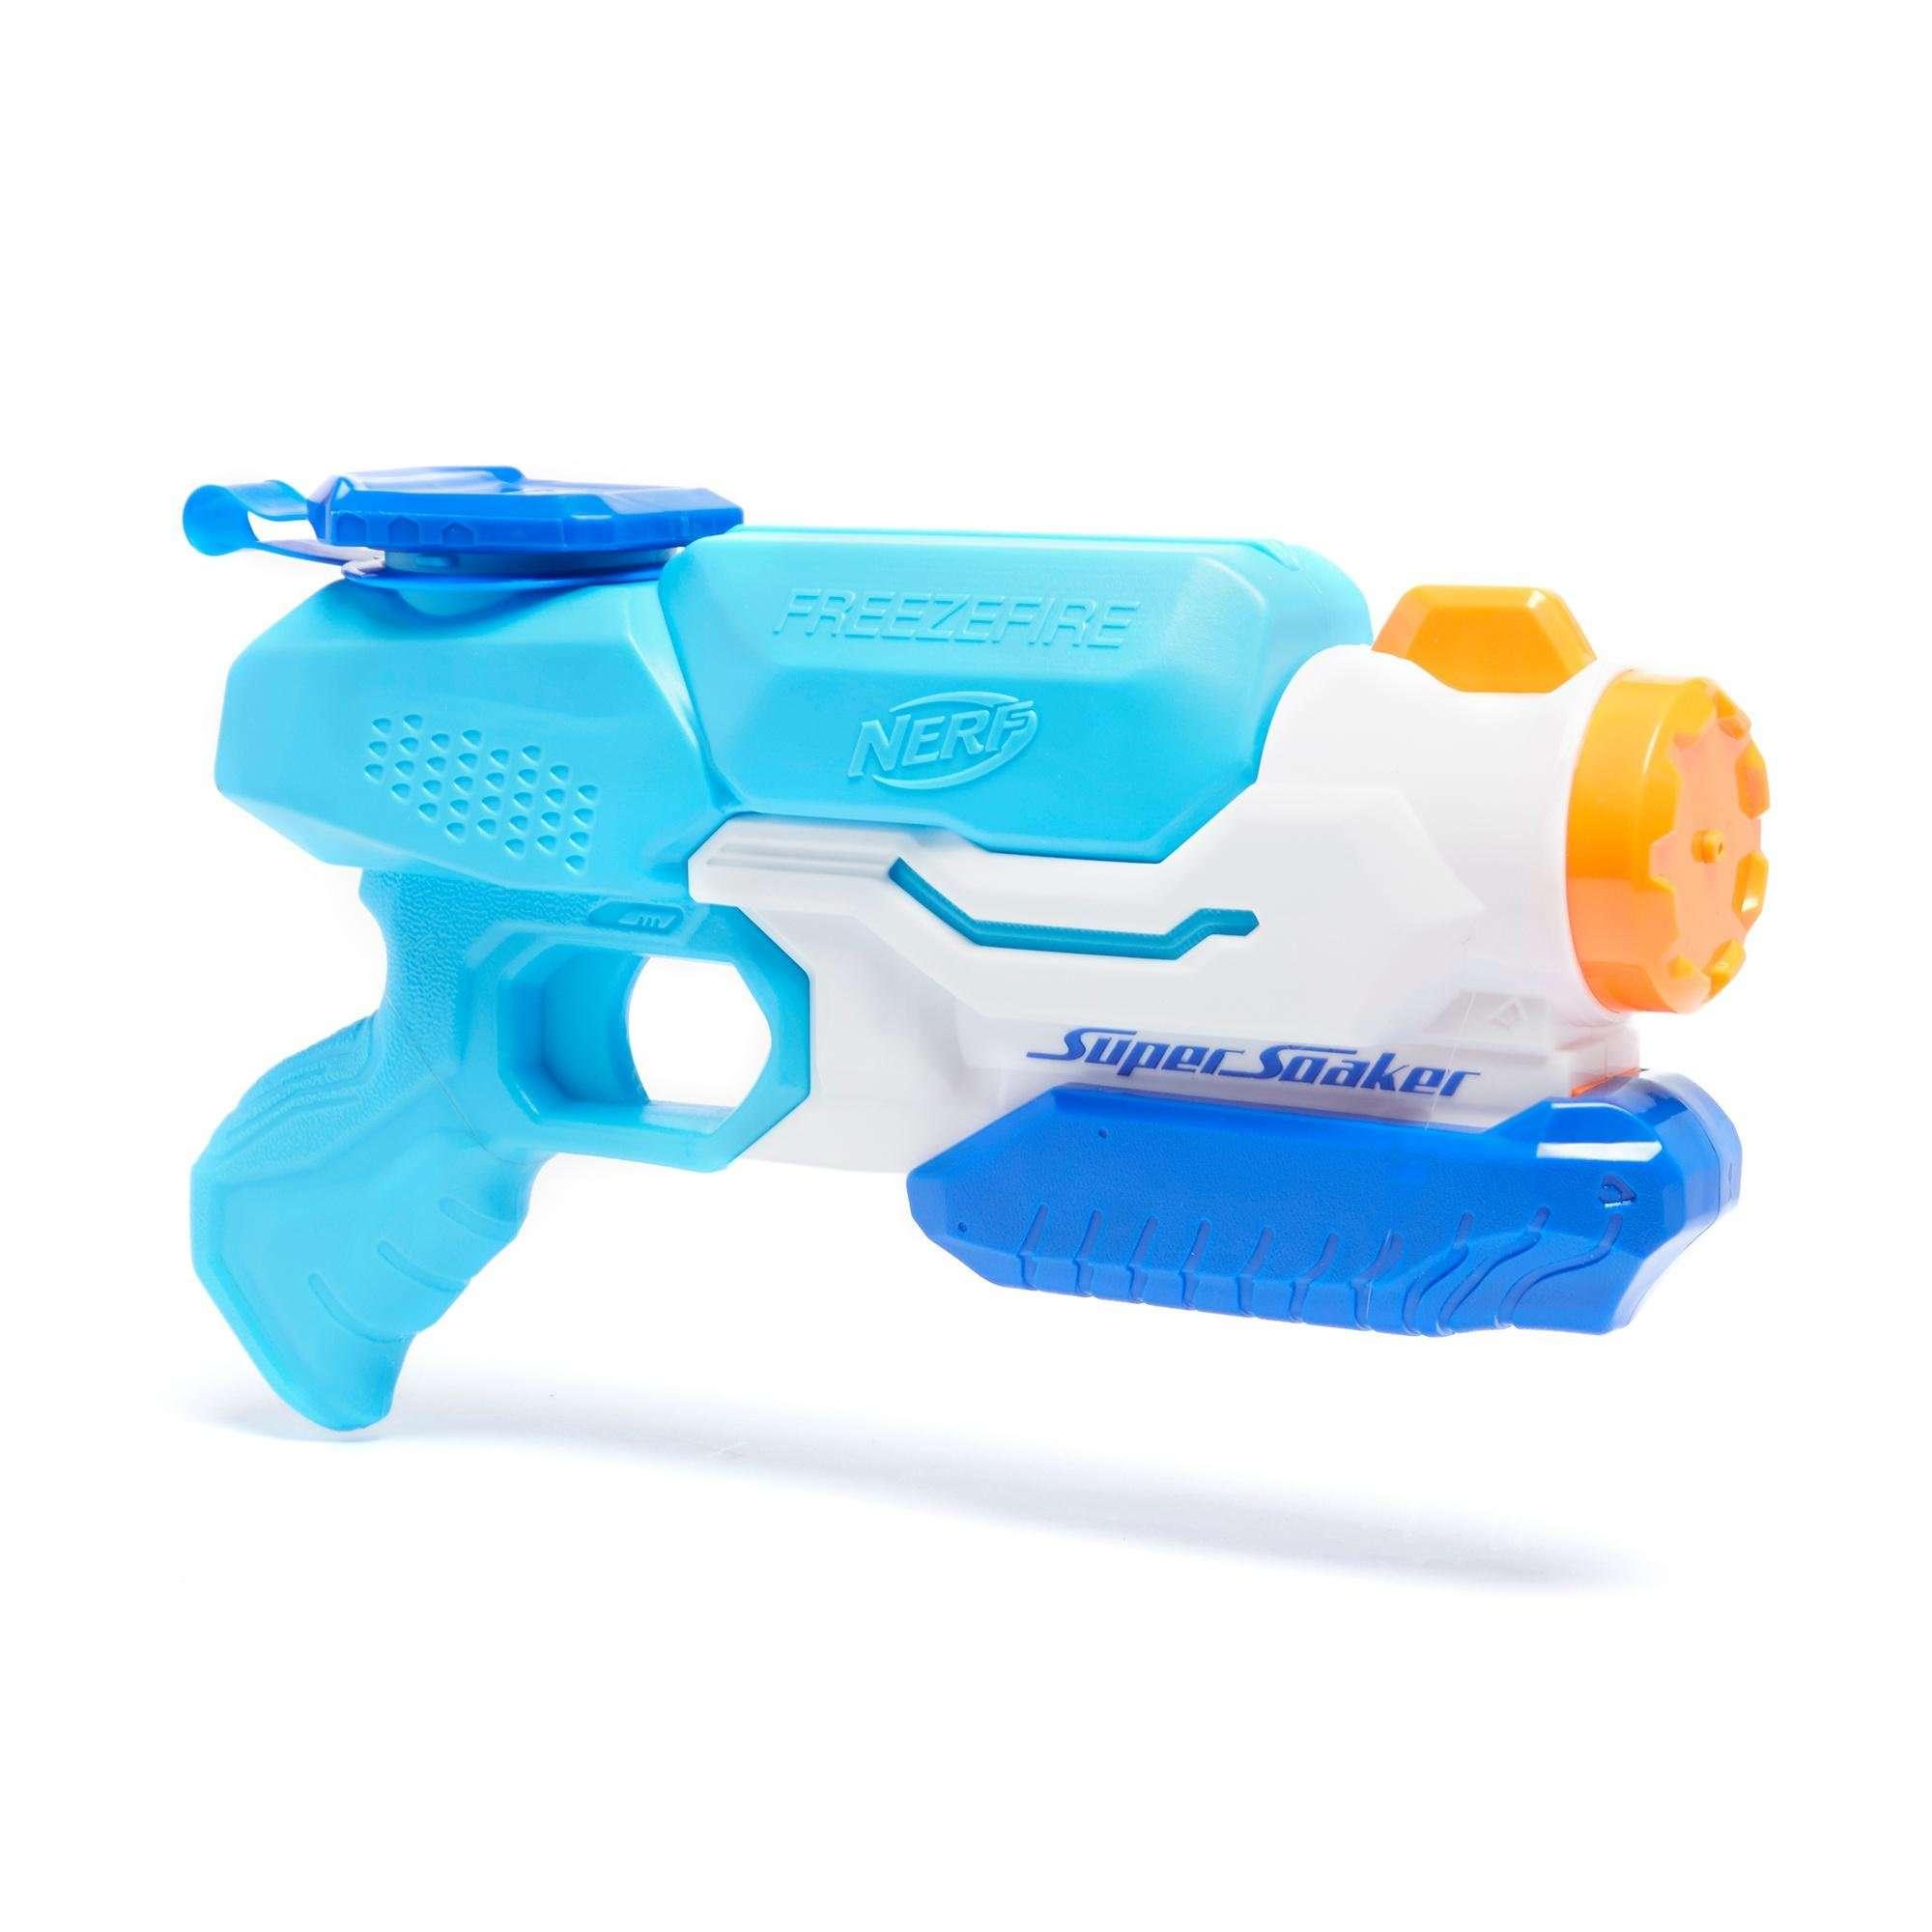 SUPER SOAKER Freezefire Water Blaster